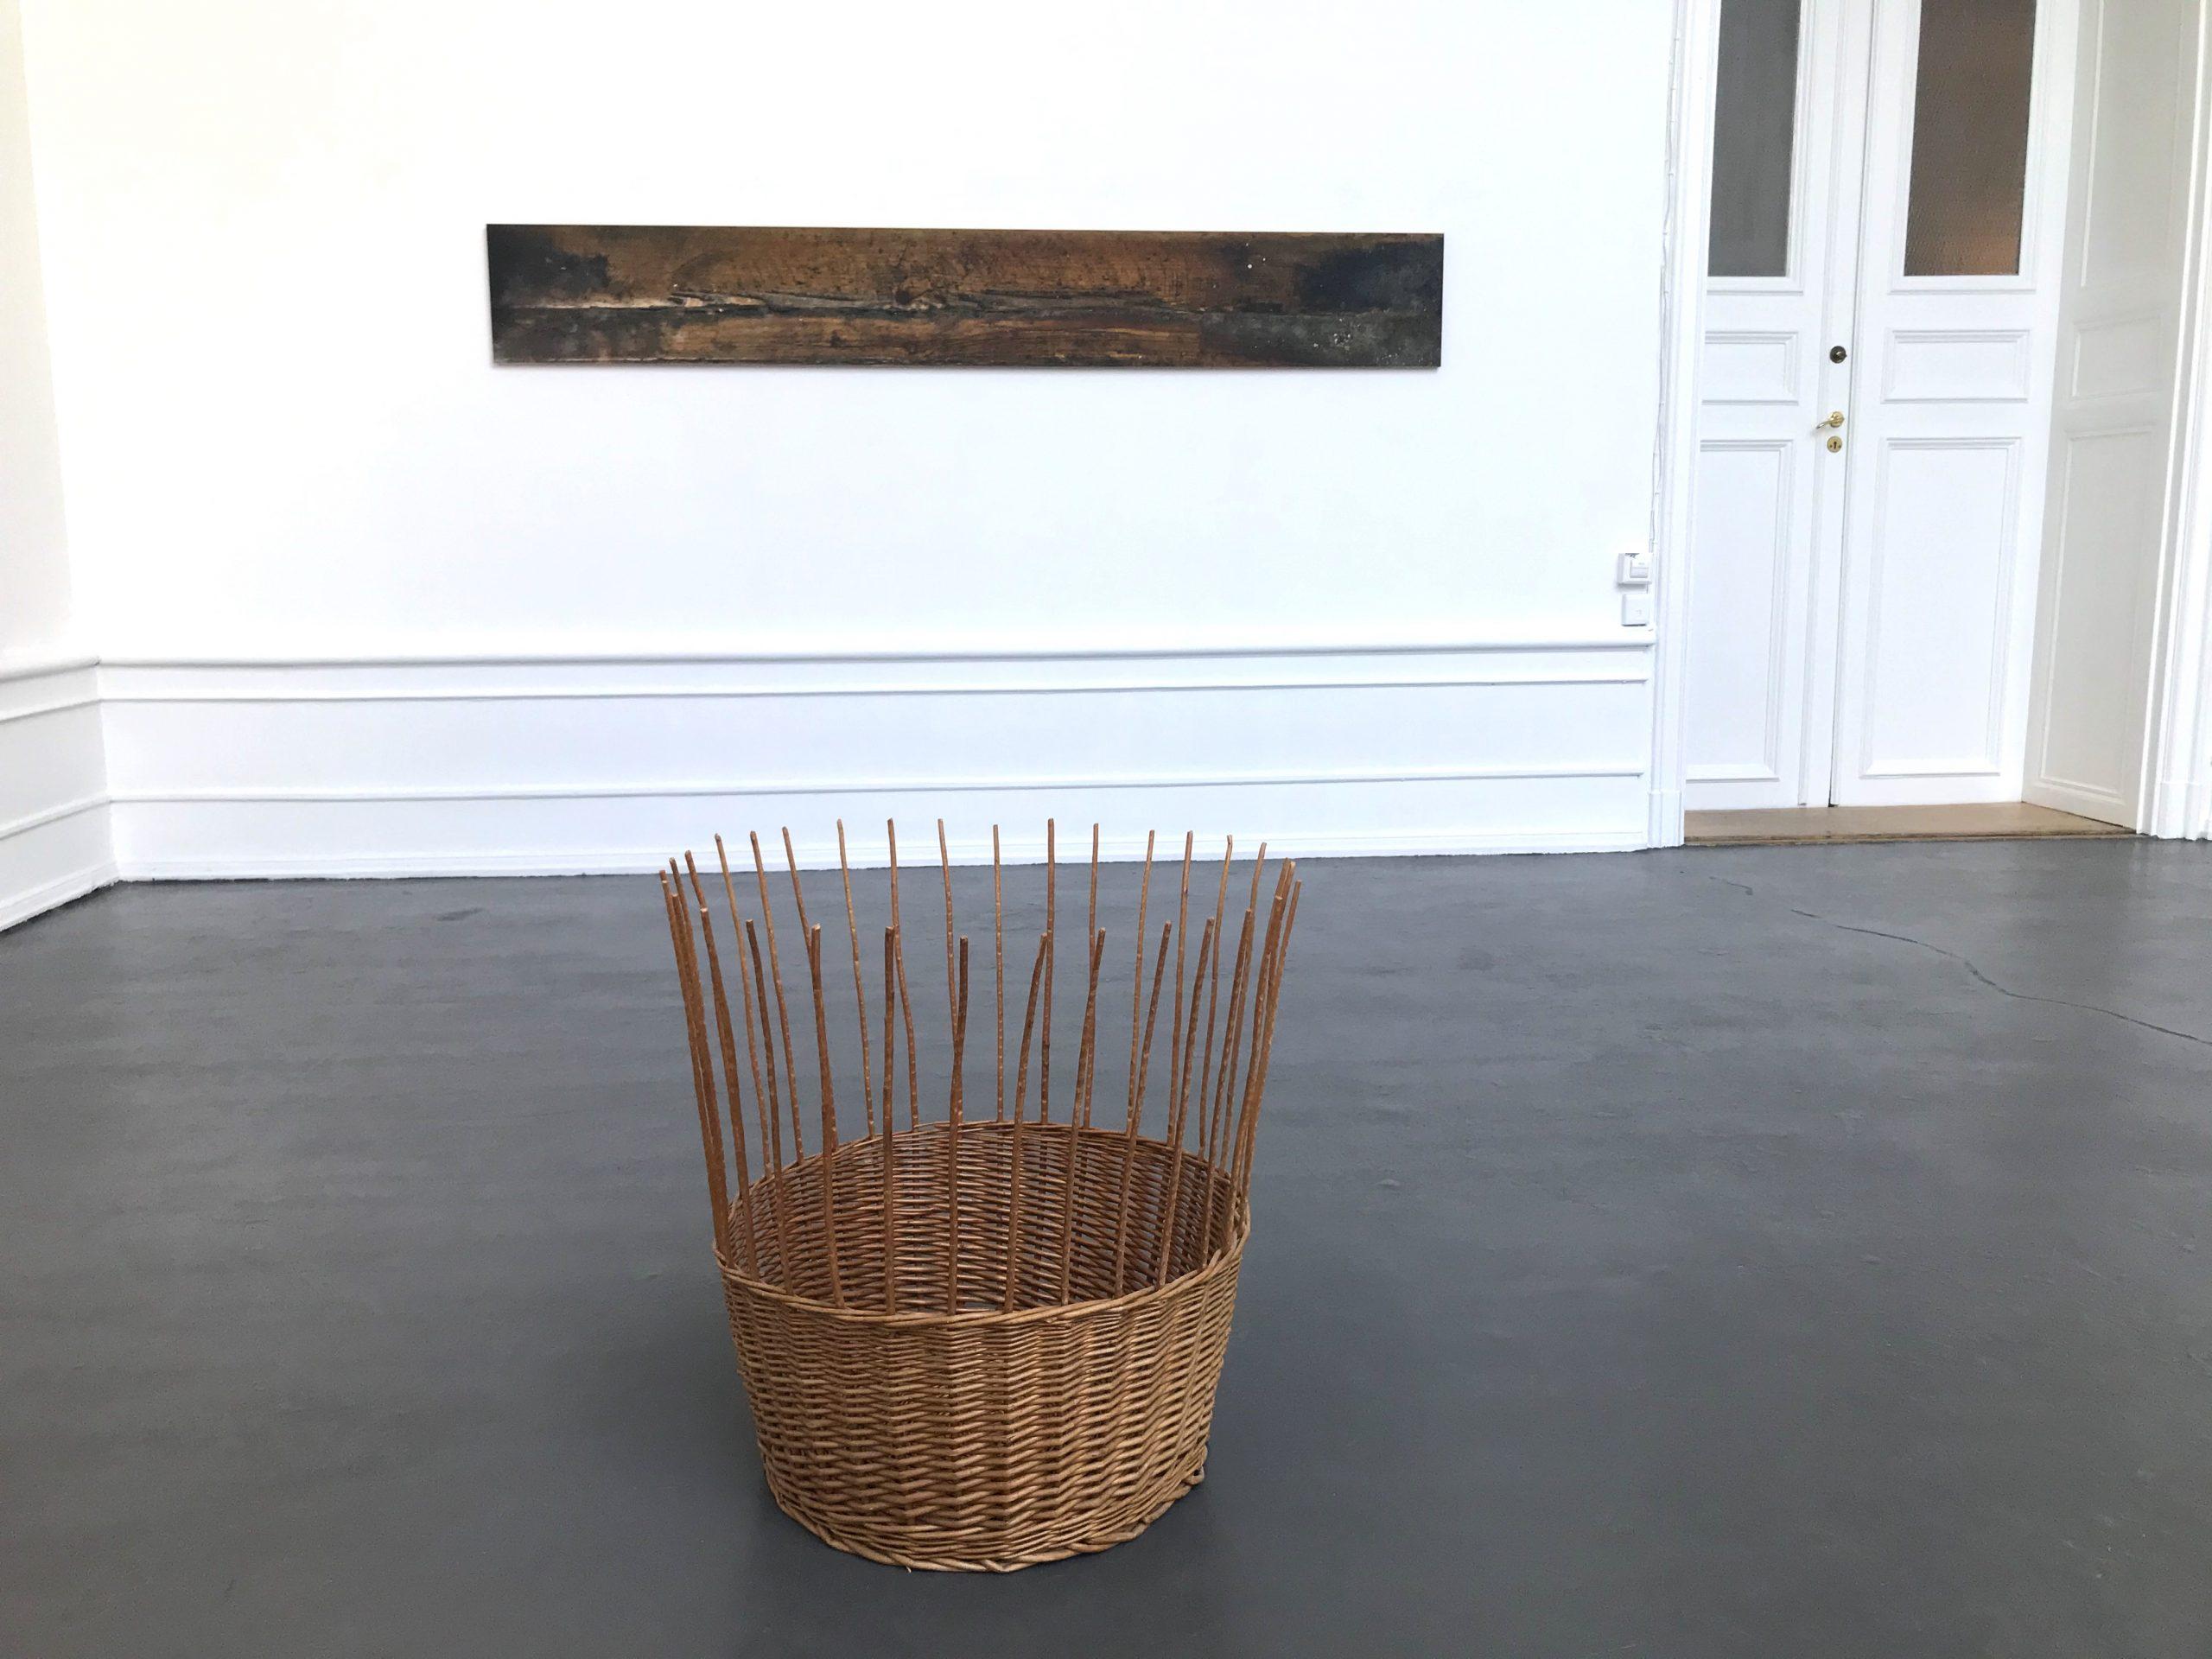 Ande och Materia / Mind and Matter, april 2020. Jakob Solgren (sculpture), Kristoffer Nilson (photography)